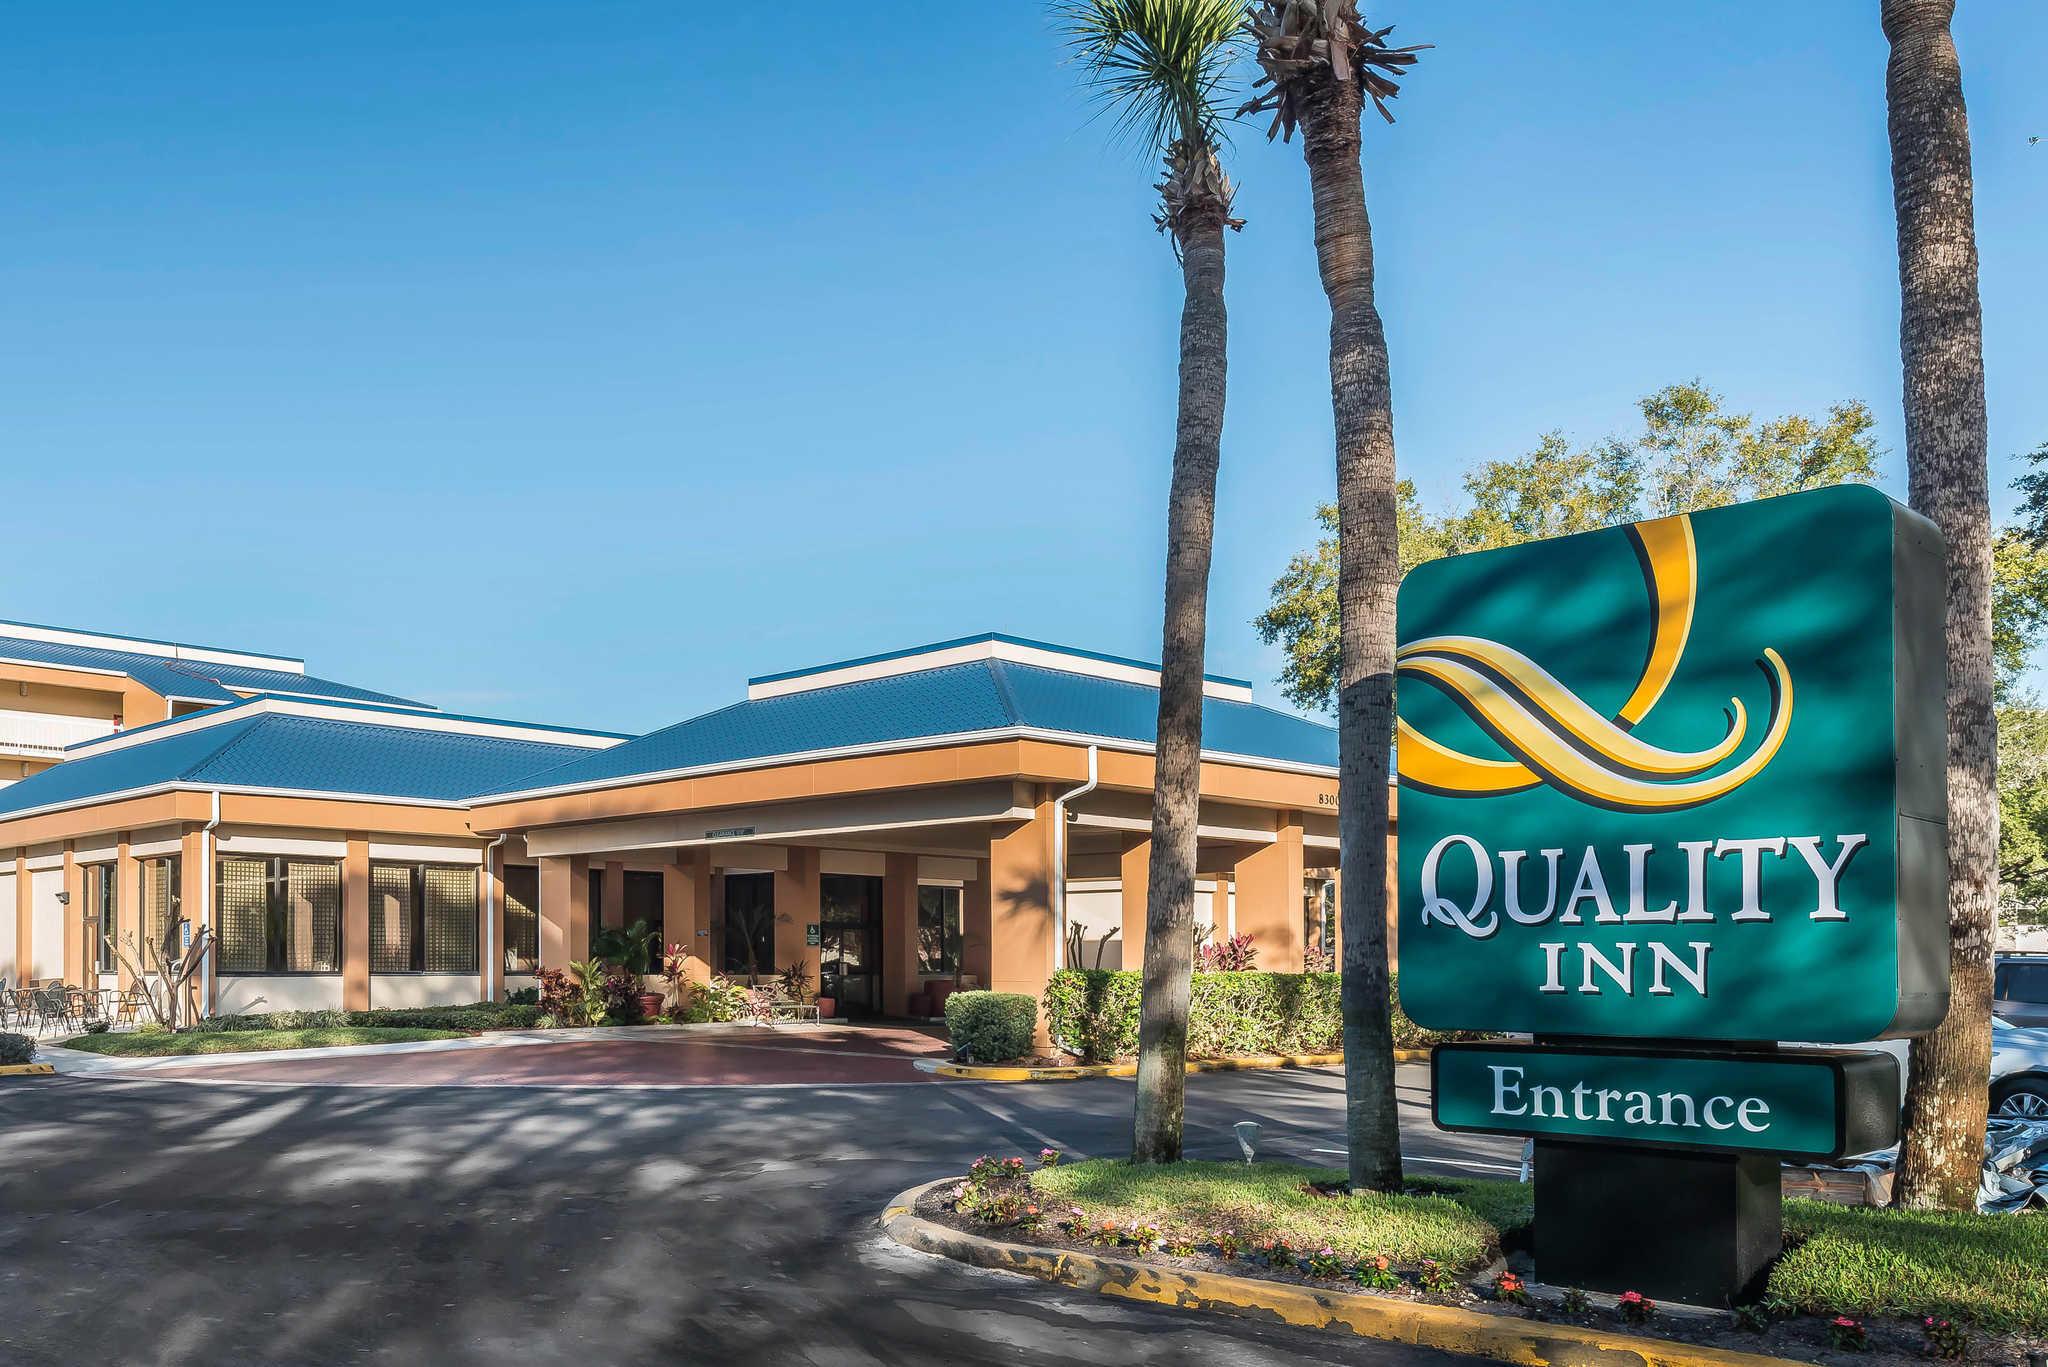 Quality Inn At International Drive image 4